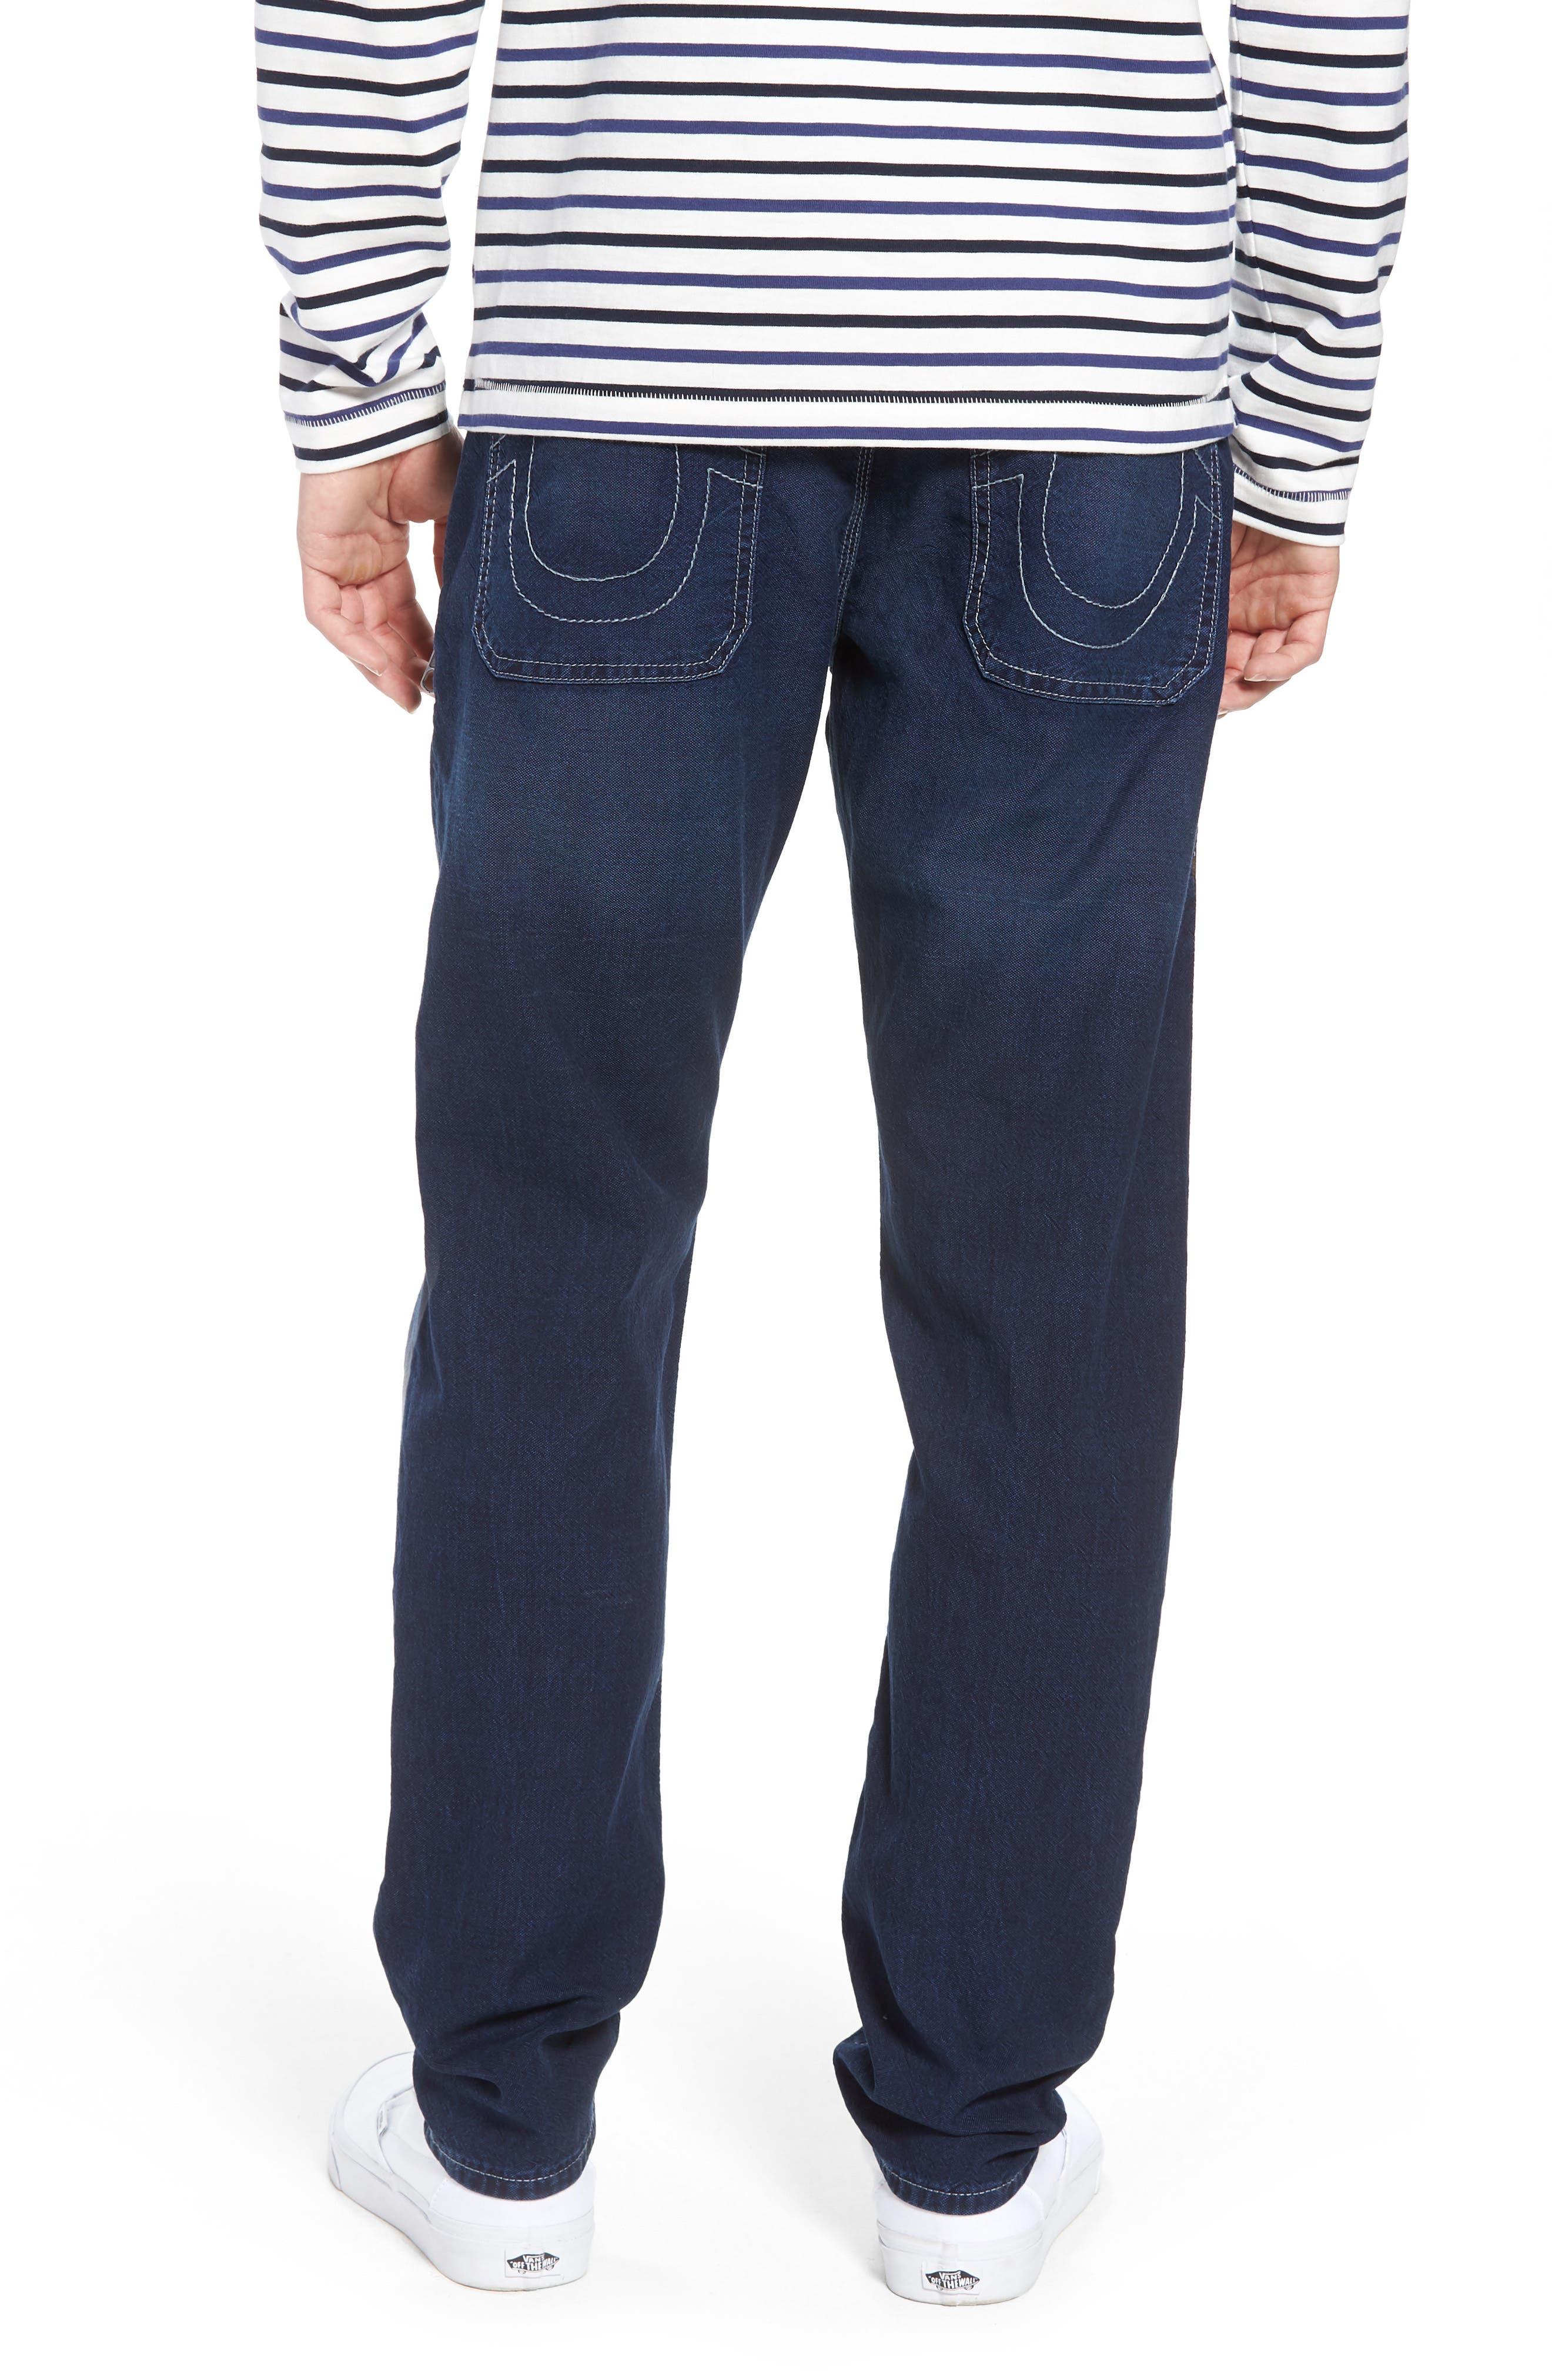 Trail Utility Jeans,                             Alternate thumbnail 2, color,                             UNION SPECIAL